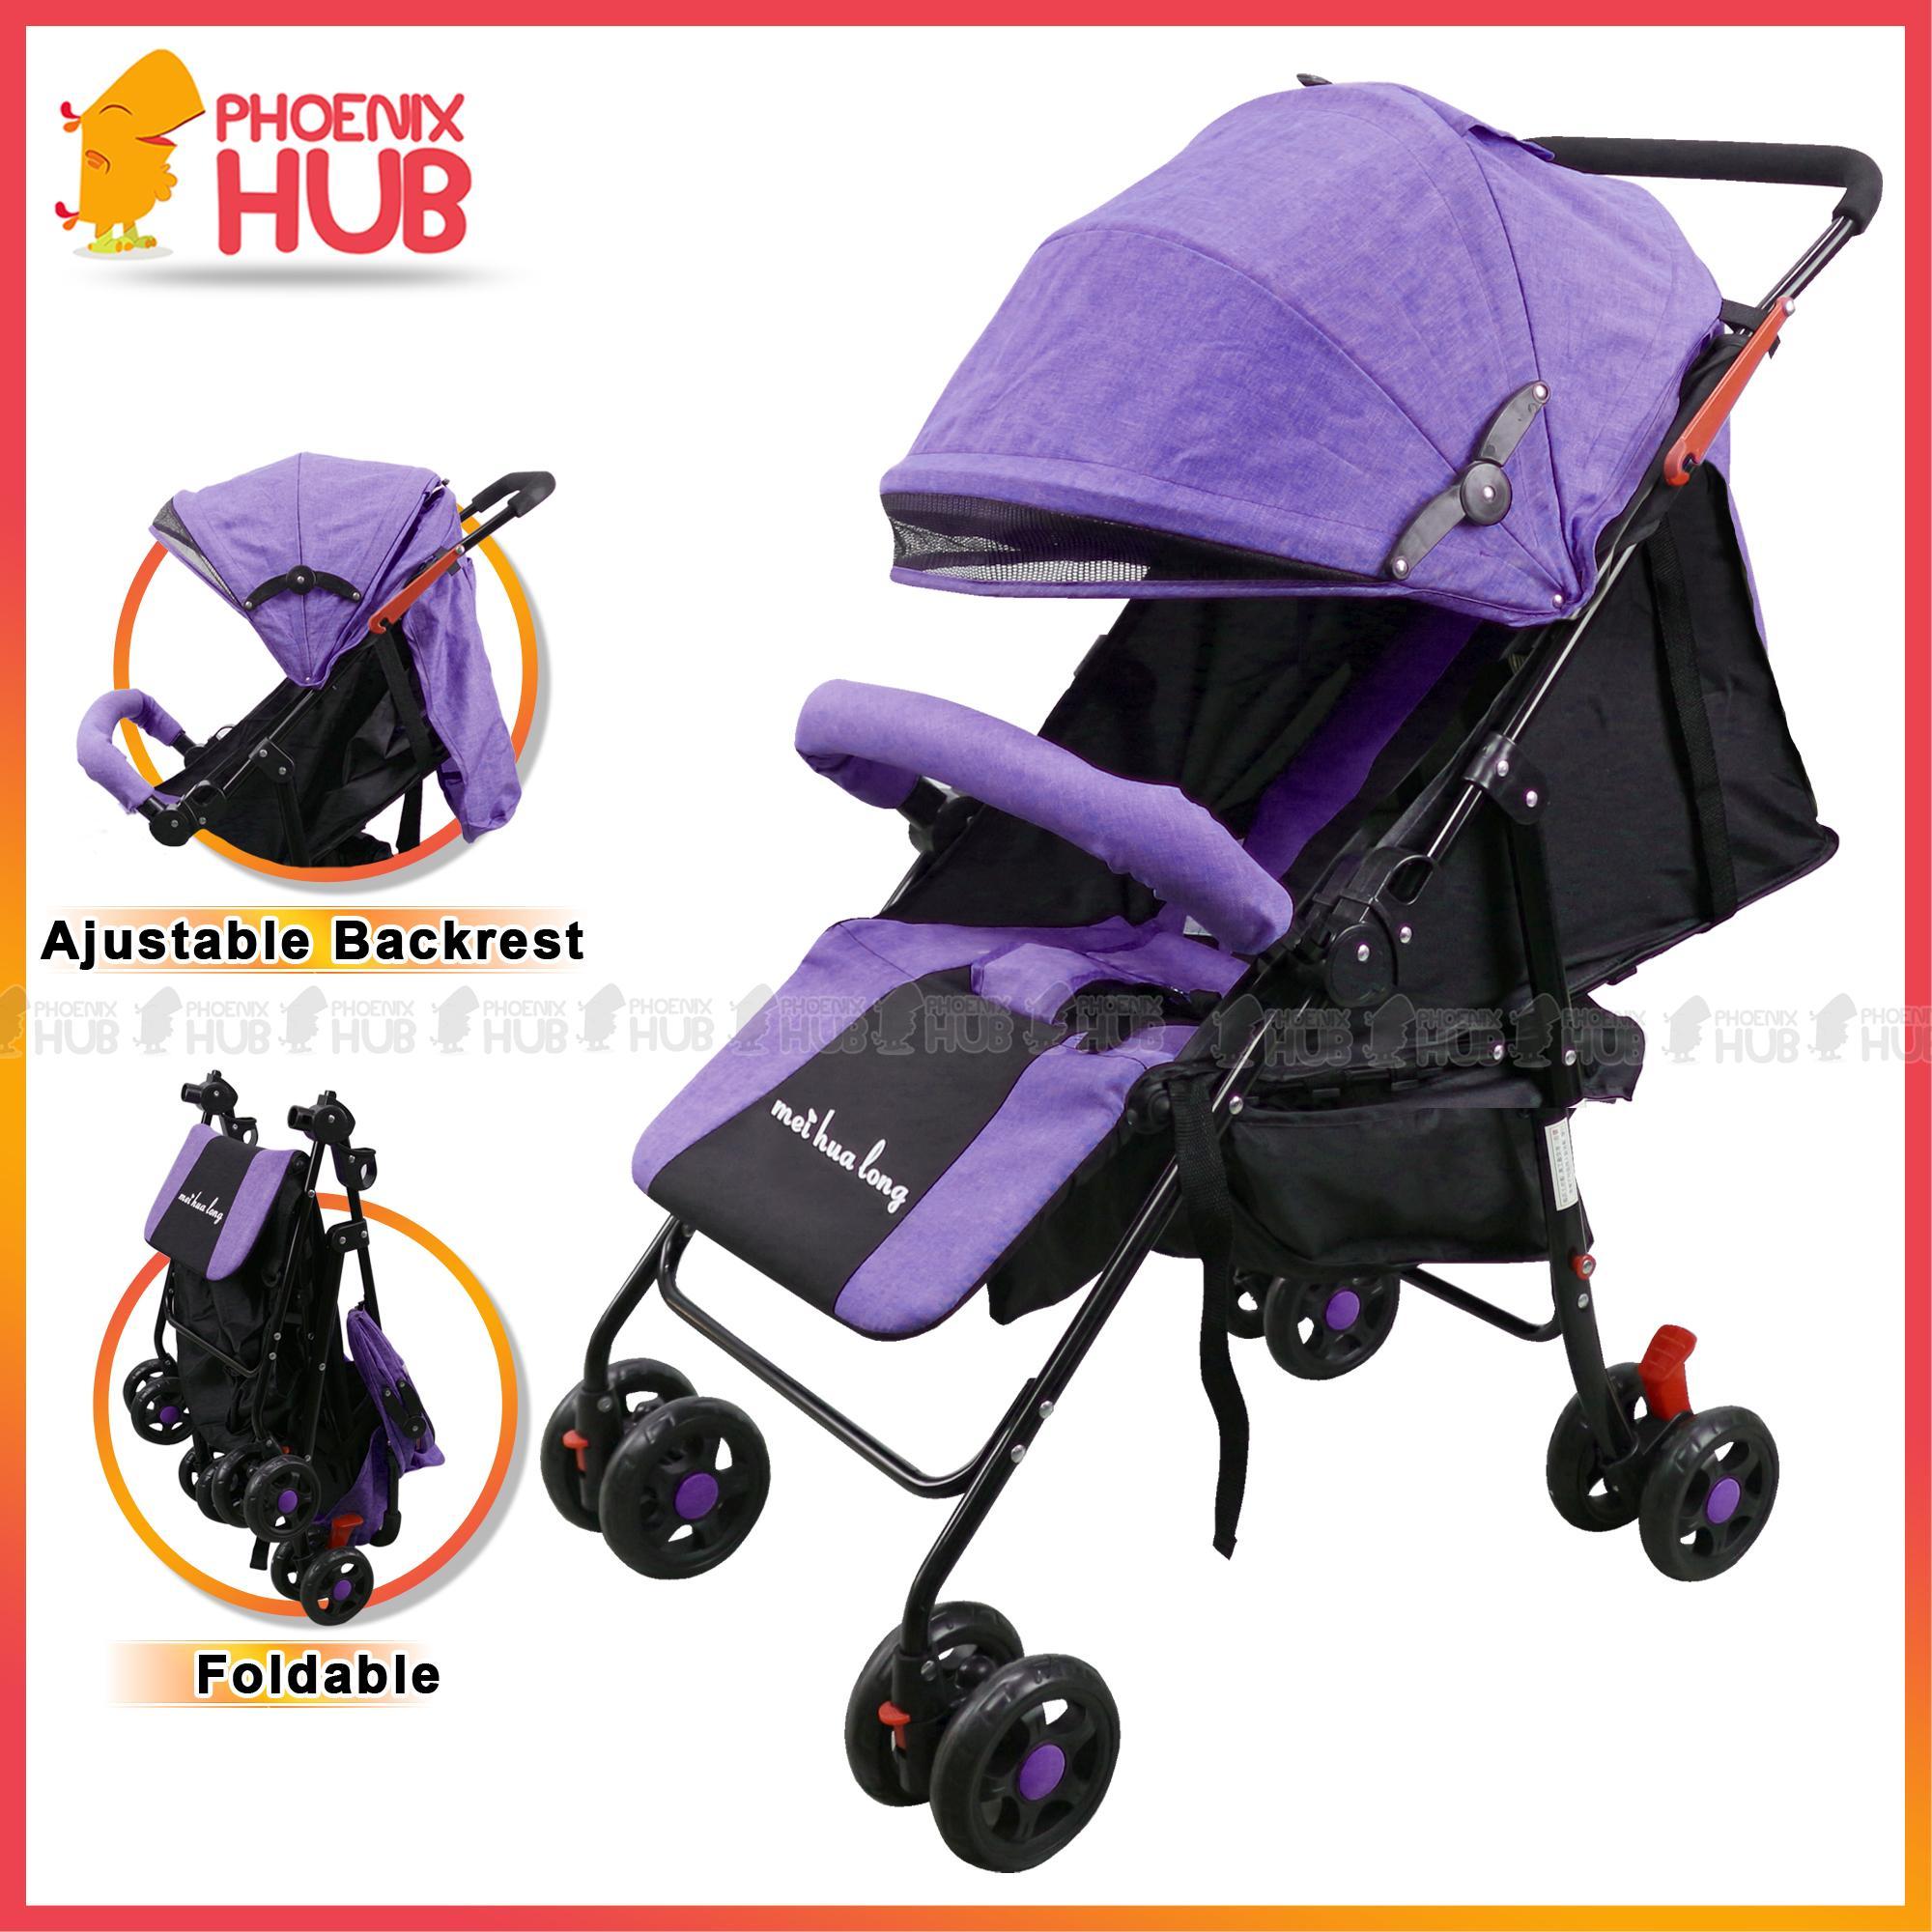 858458c5cbb4 Phoenix Hub T608 Baby Stroller Travel System Super Lightweight Stroller  Foldable Stroller Push Chair Portable Stroller Pocket Stroller